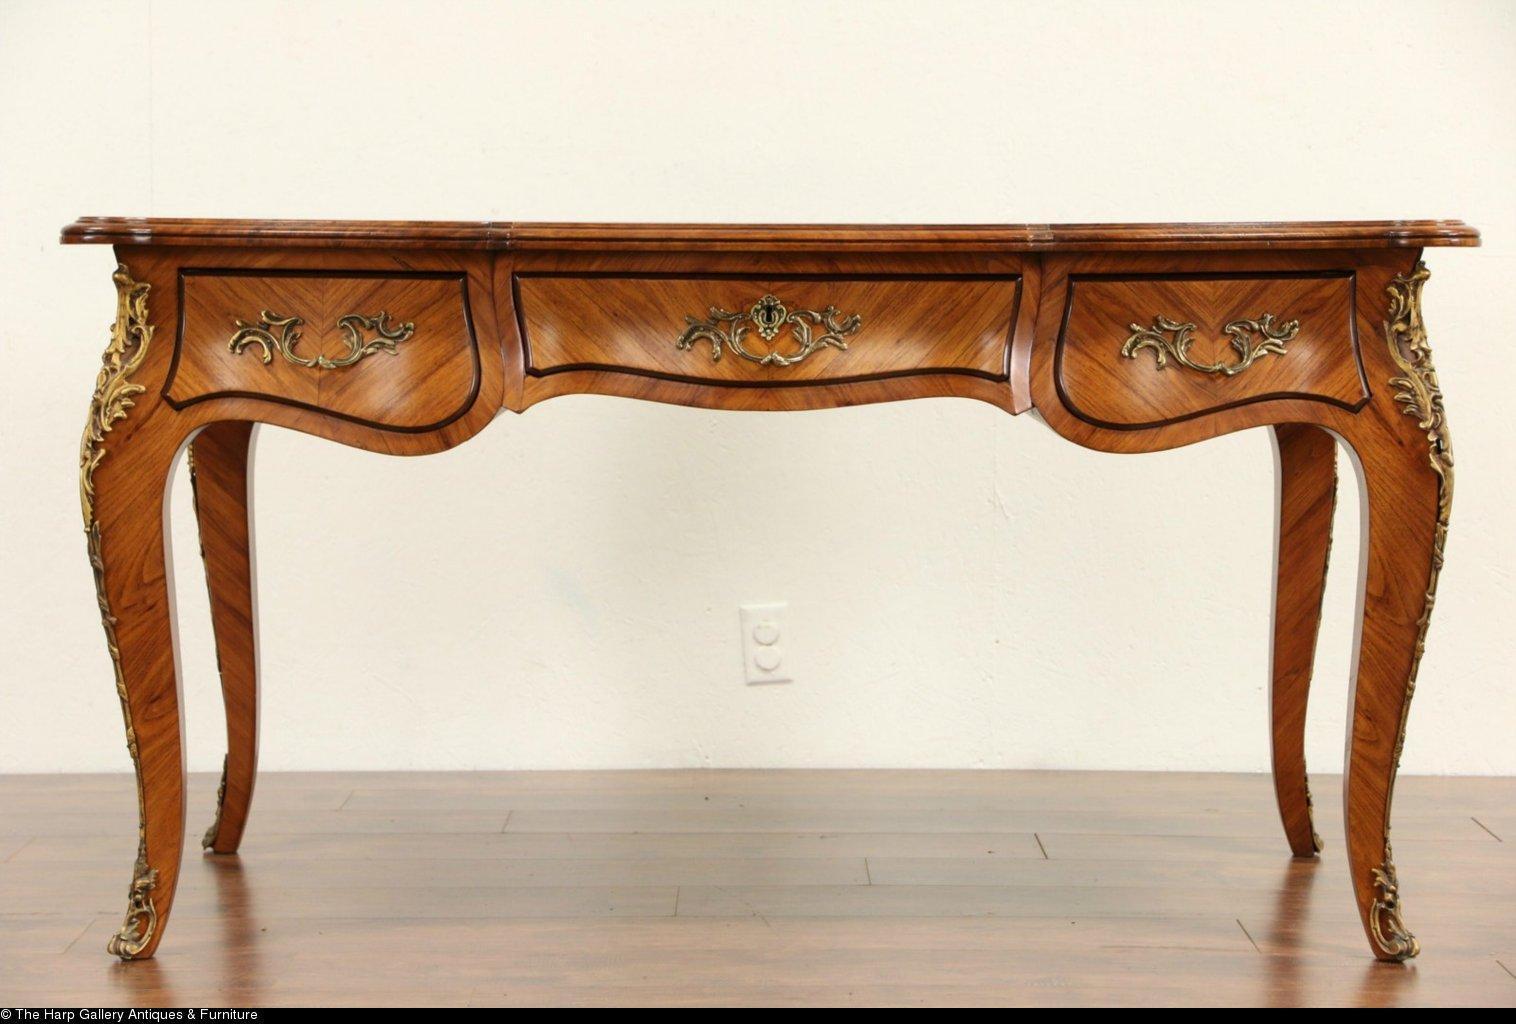 french louis xiv 1900 39 s antique tulipwood bureau plat desk bronze from harpgallery on ruby lane. Black Bedroom Furniture Sets. Home Design Ideas